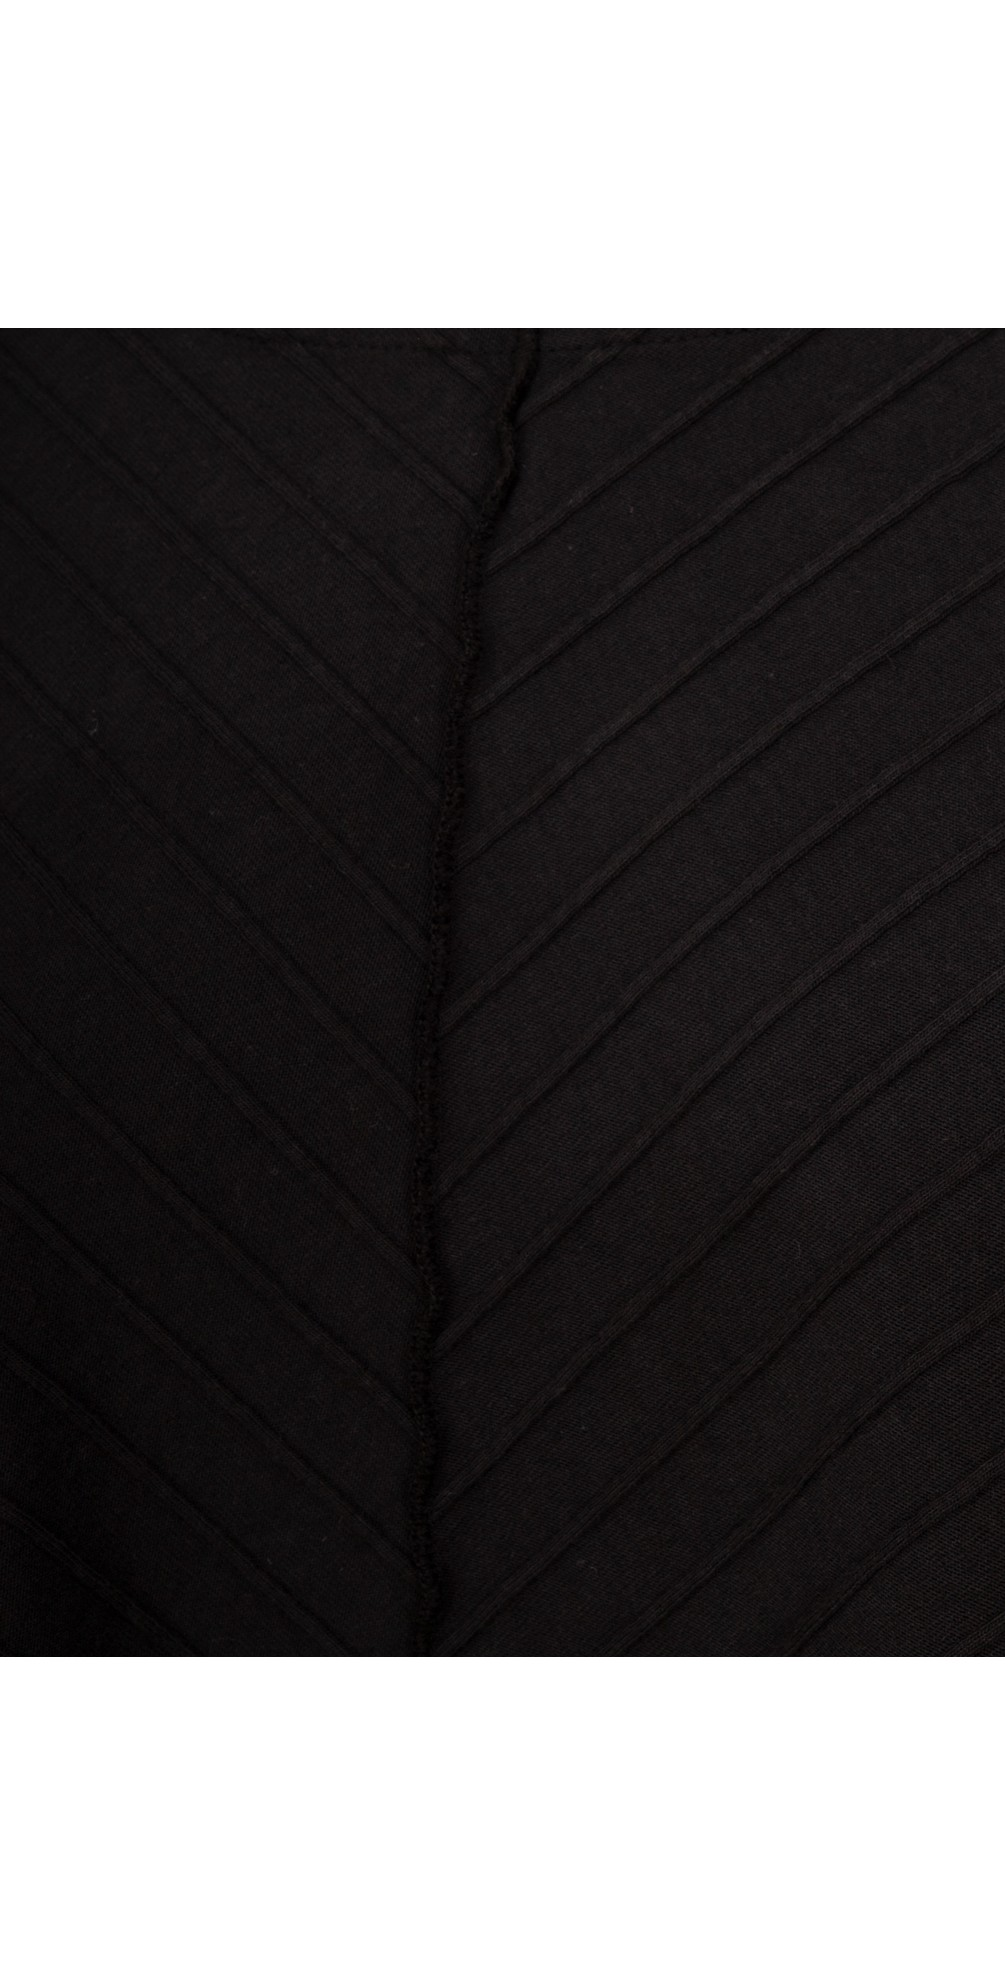 3/4 Sleeve A-Line Tunic main image